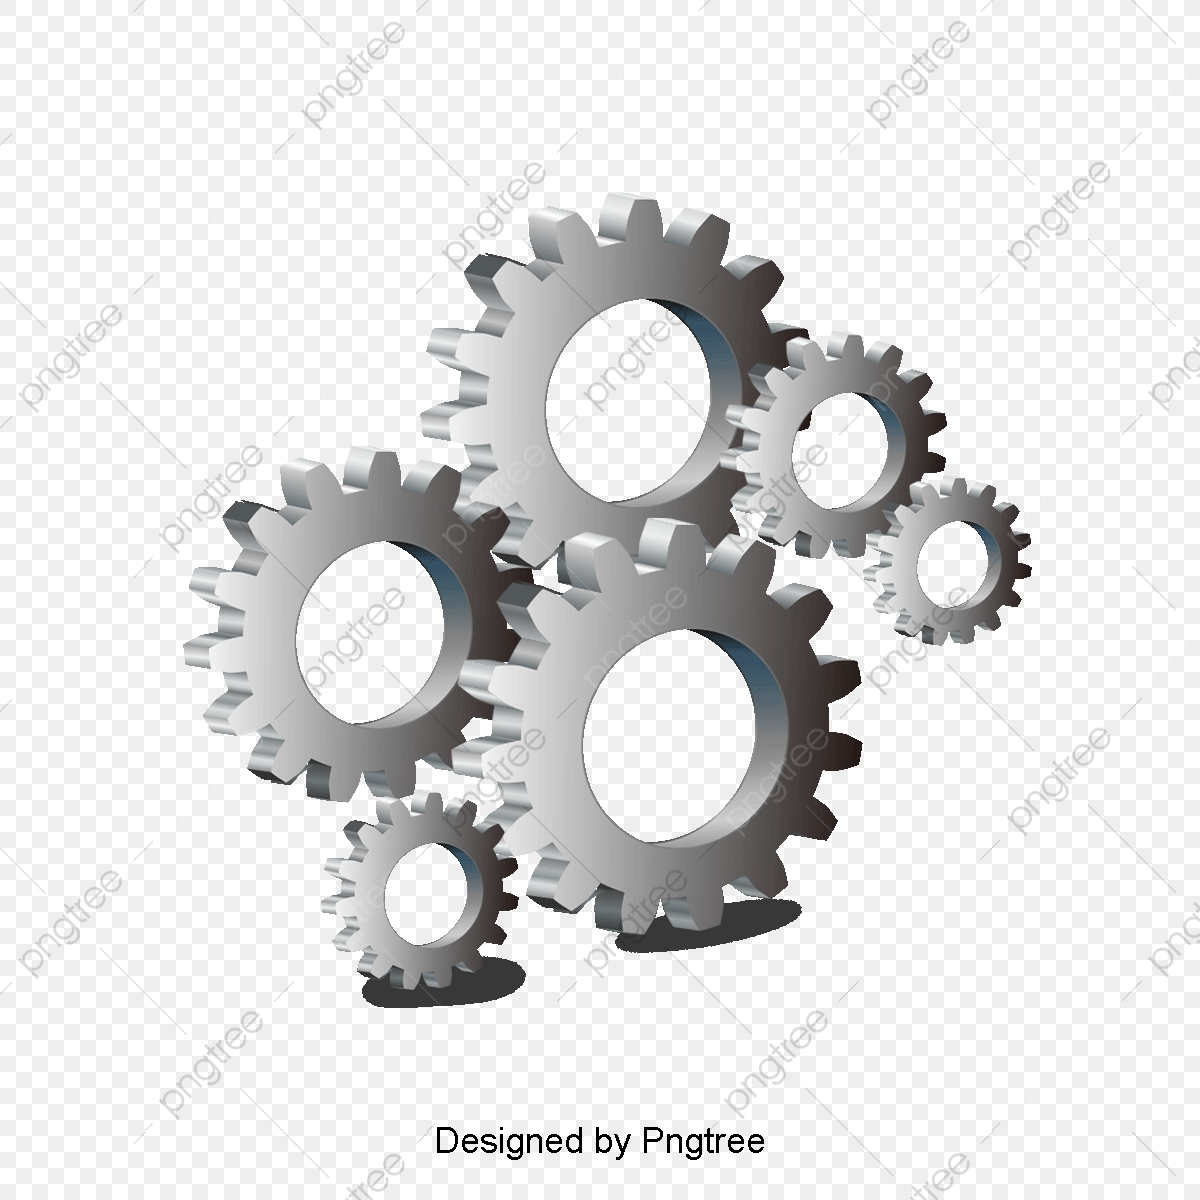 Mechanical mechanics rotate png. Mechanic clipart many gear